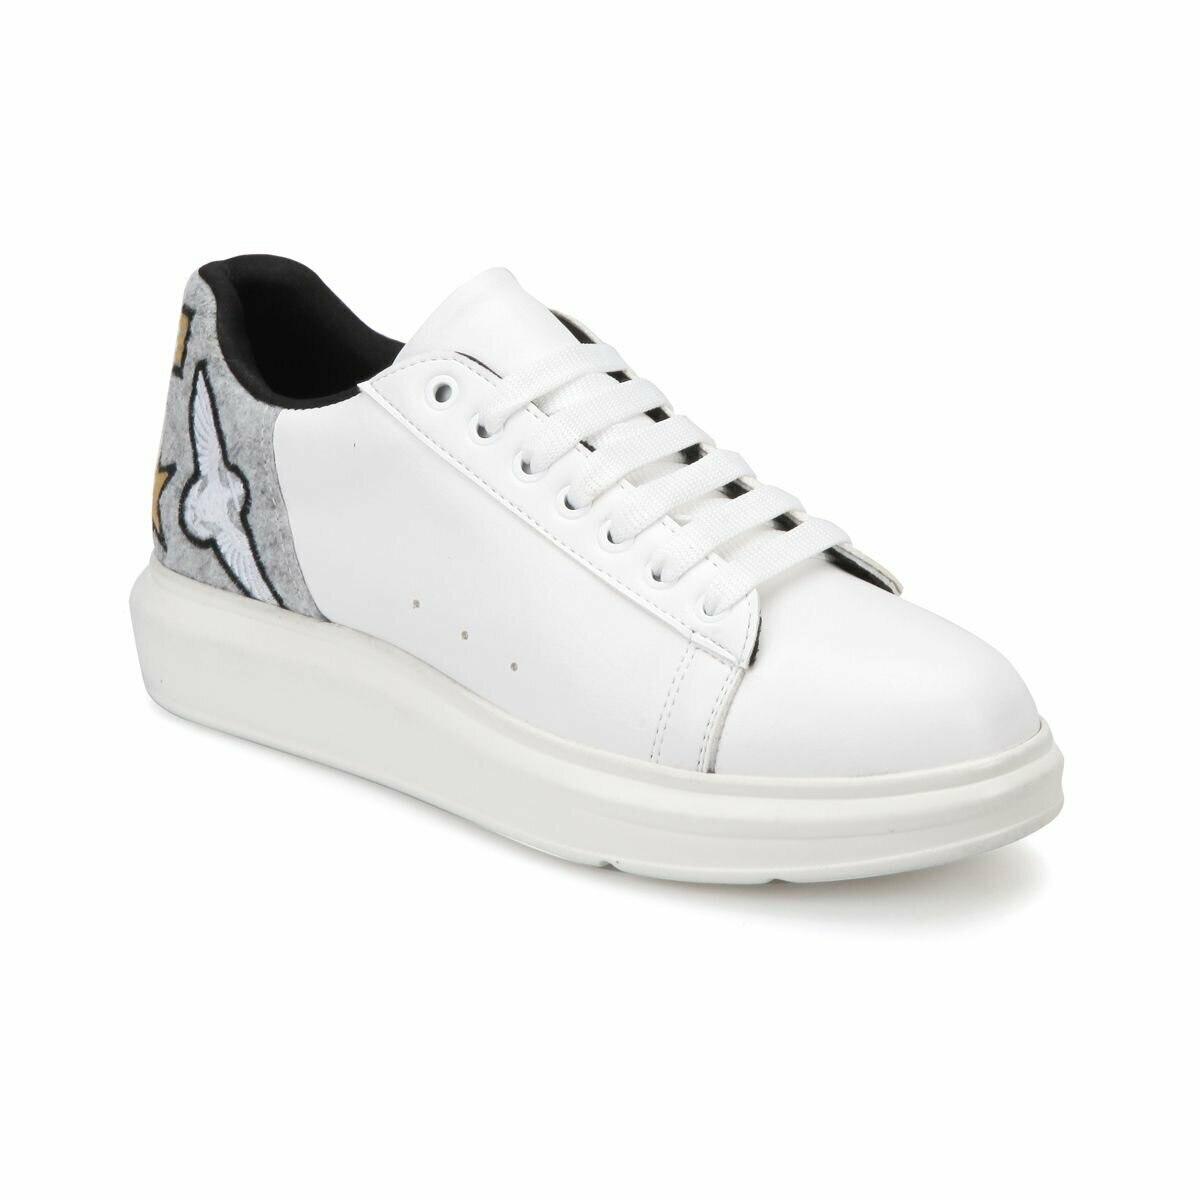 FLO 18S-540 White Women 'S Sneaker Shoes BUTIGO